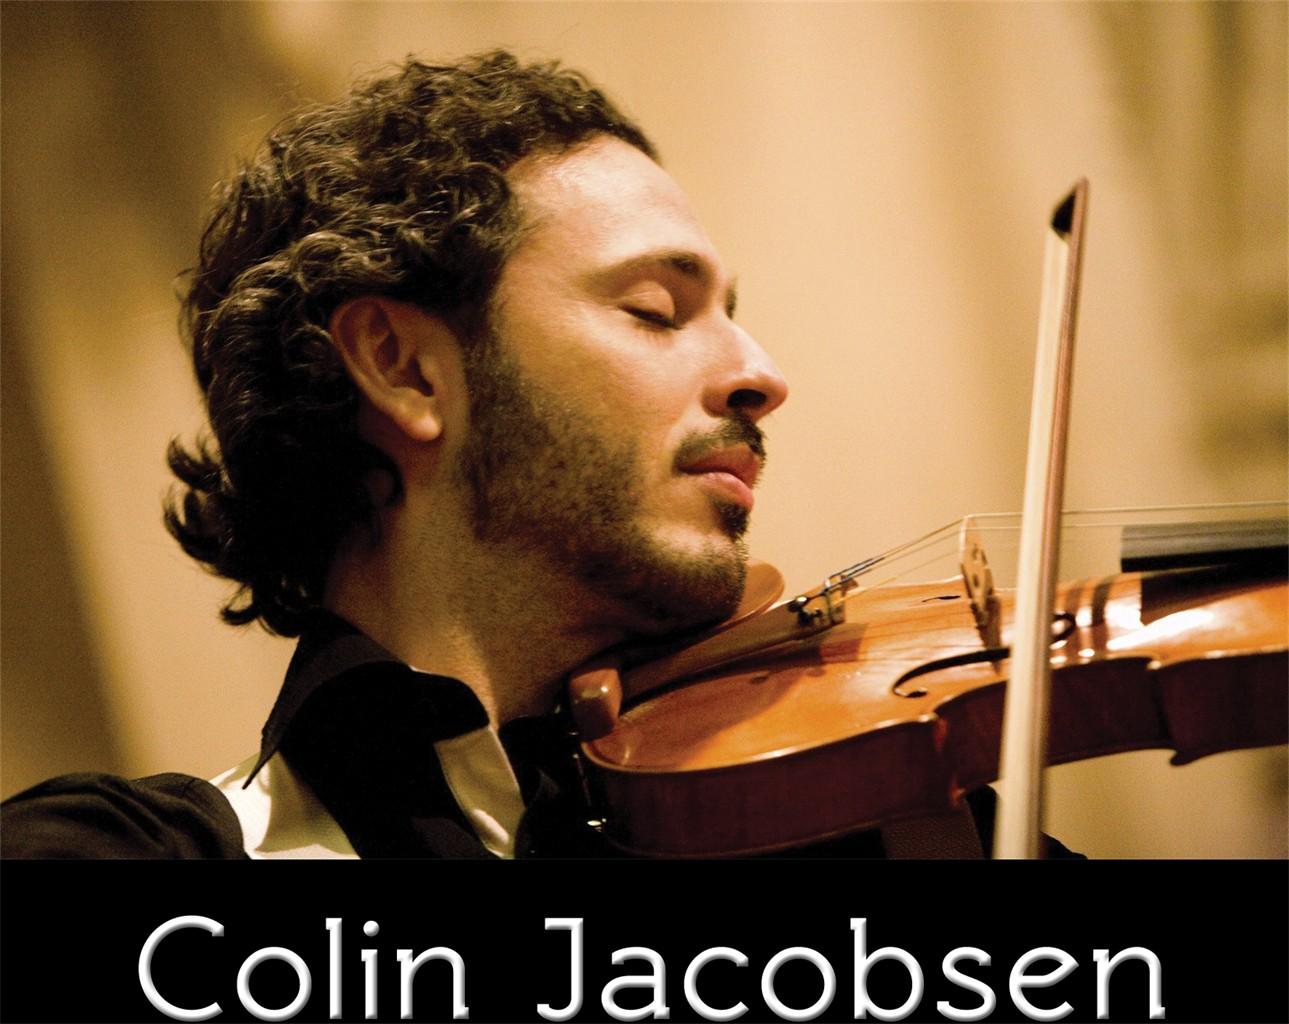 Colin Jacobsen